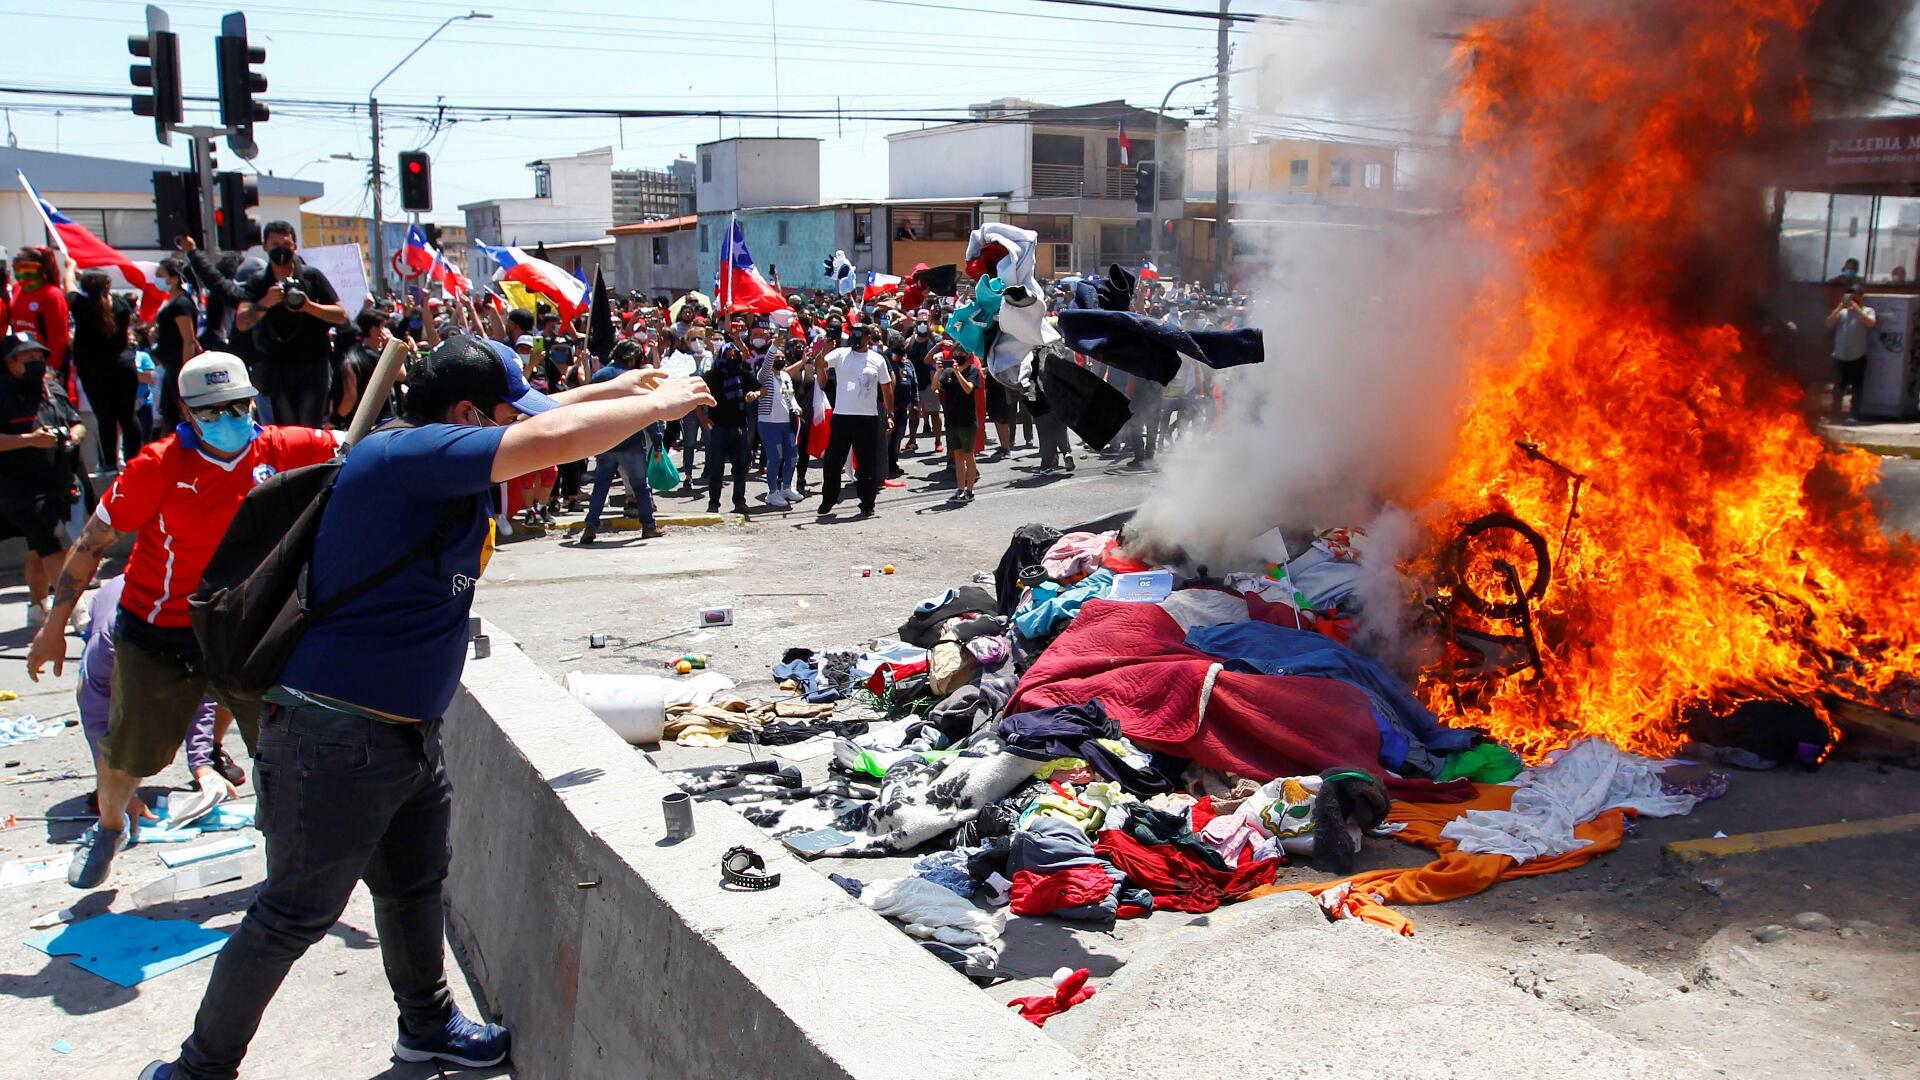 Chili-manifestation-anti-migrants-26-sep-2021